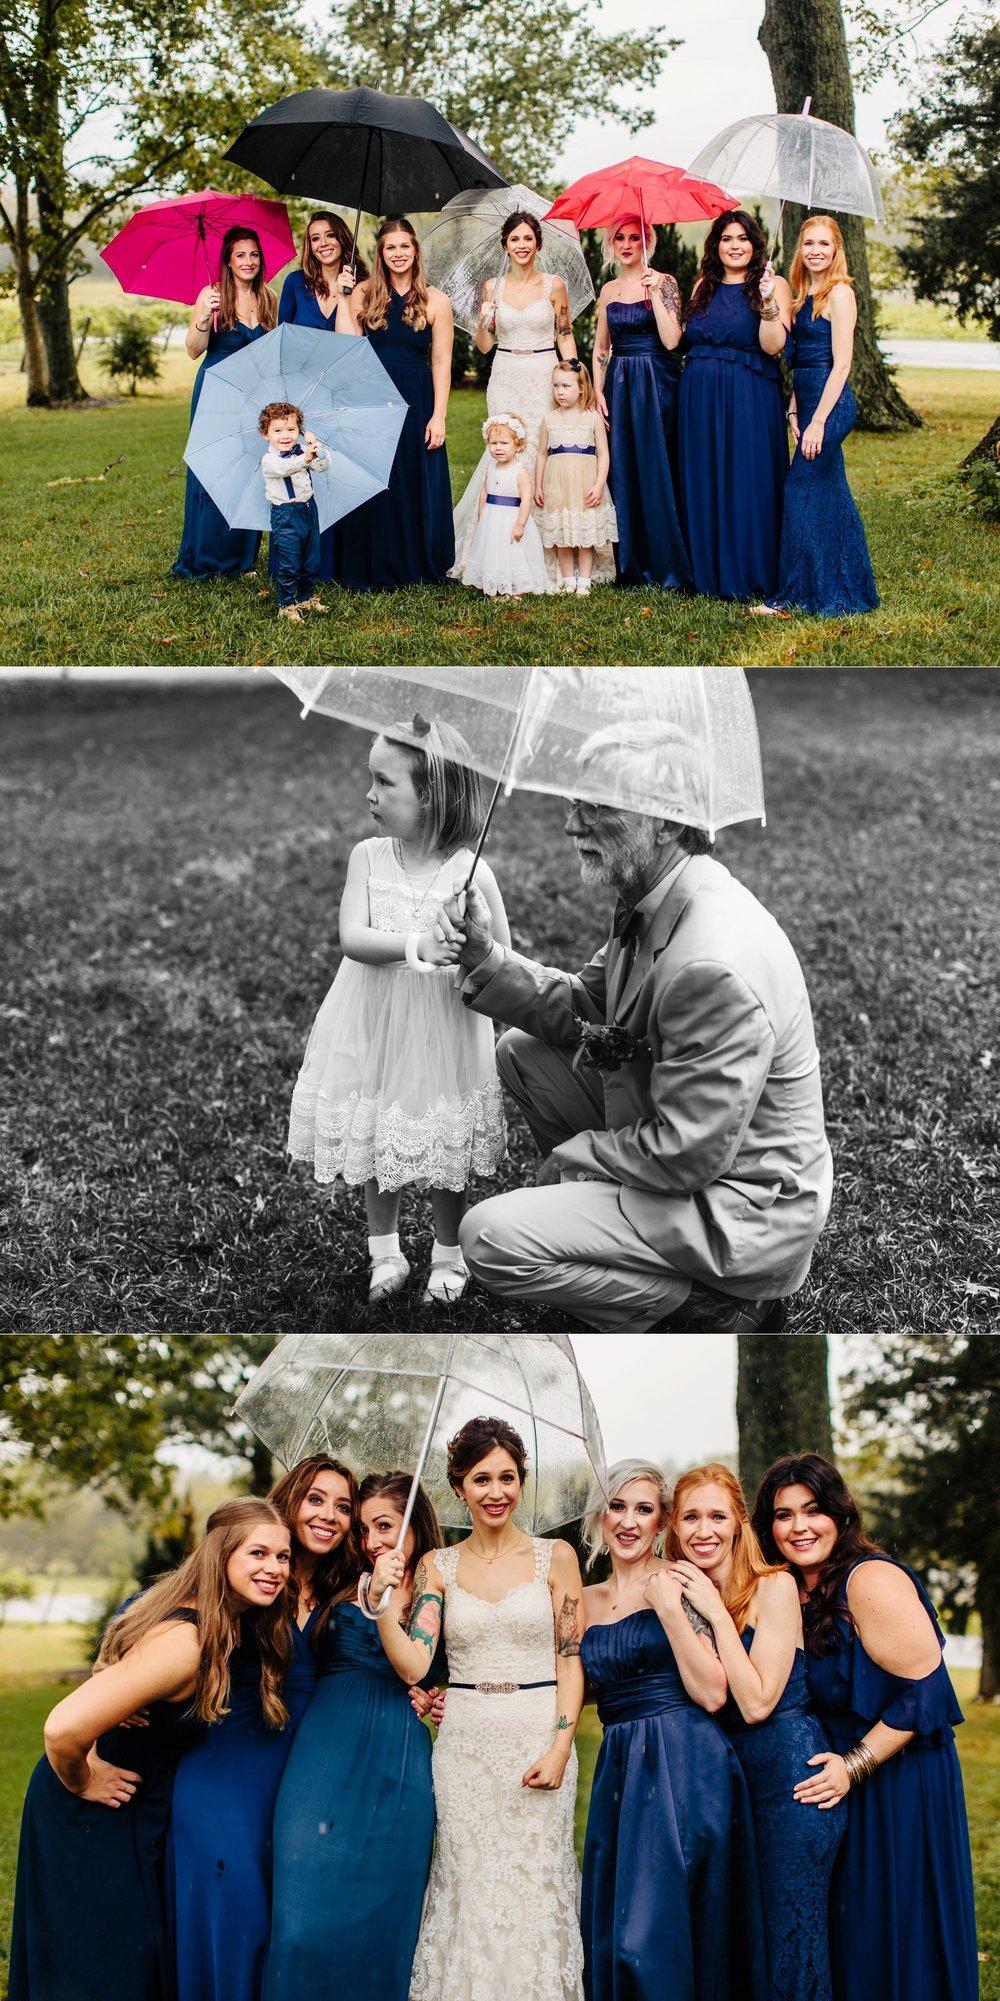 CK-Photo-arrington-wedding_0005.jpg